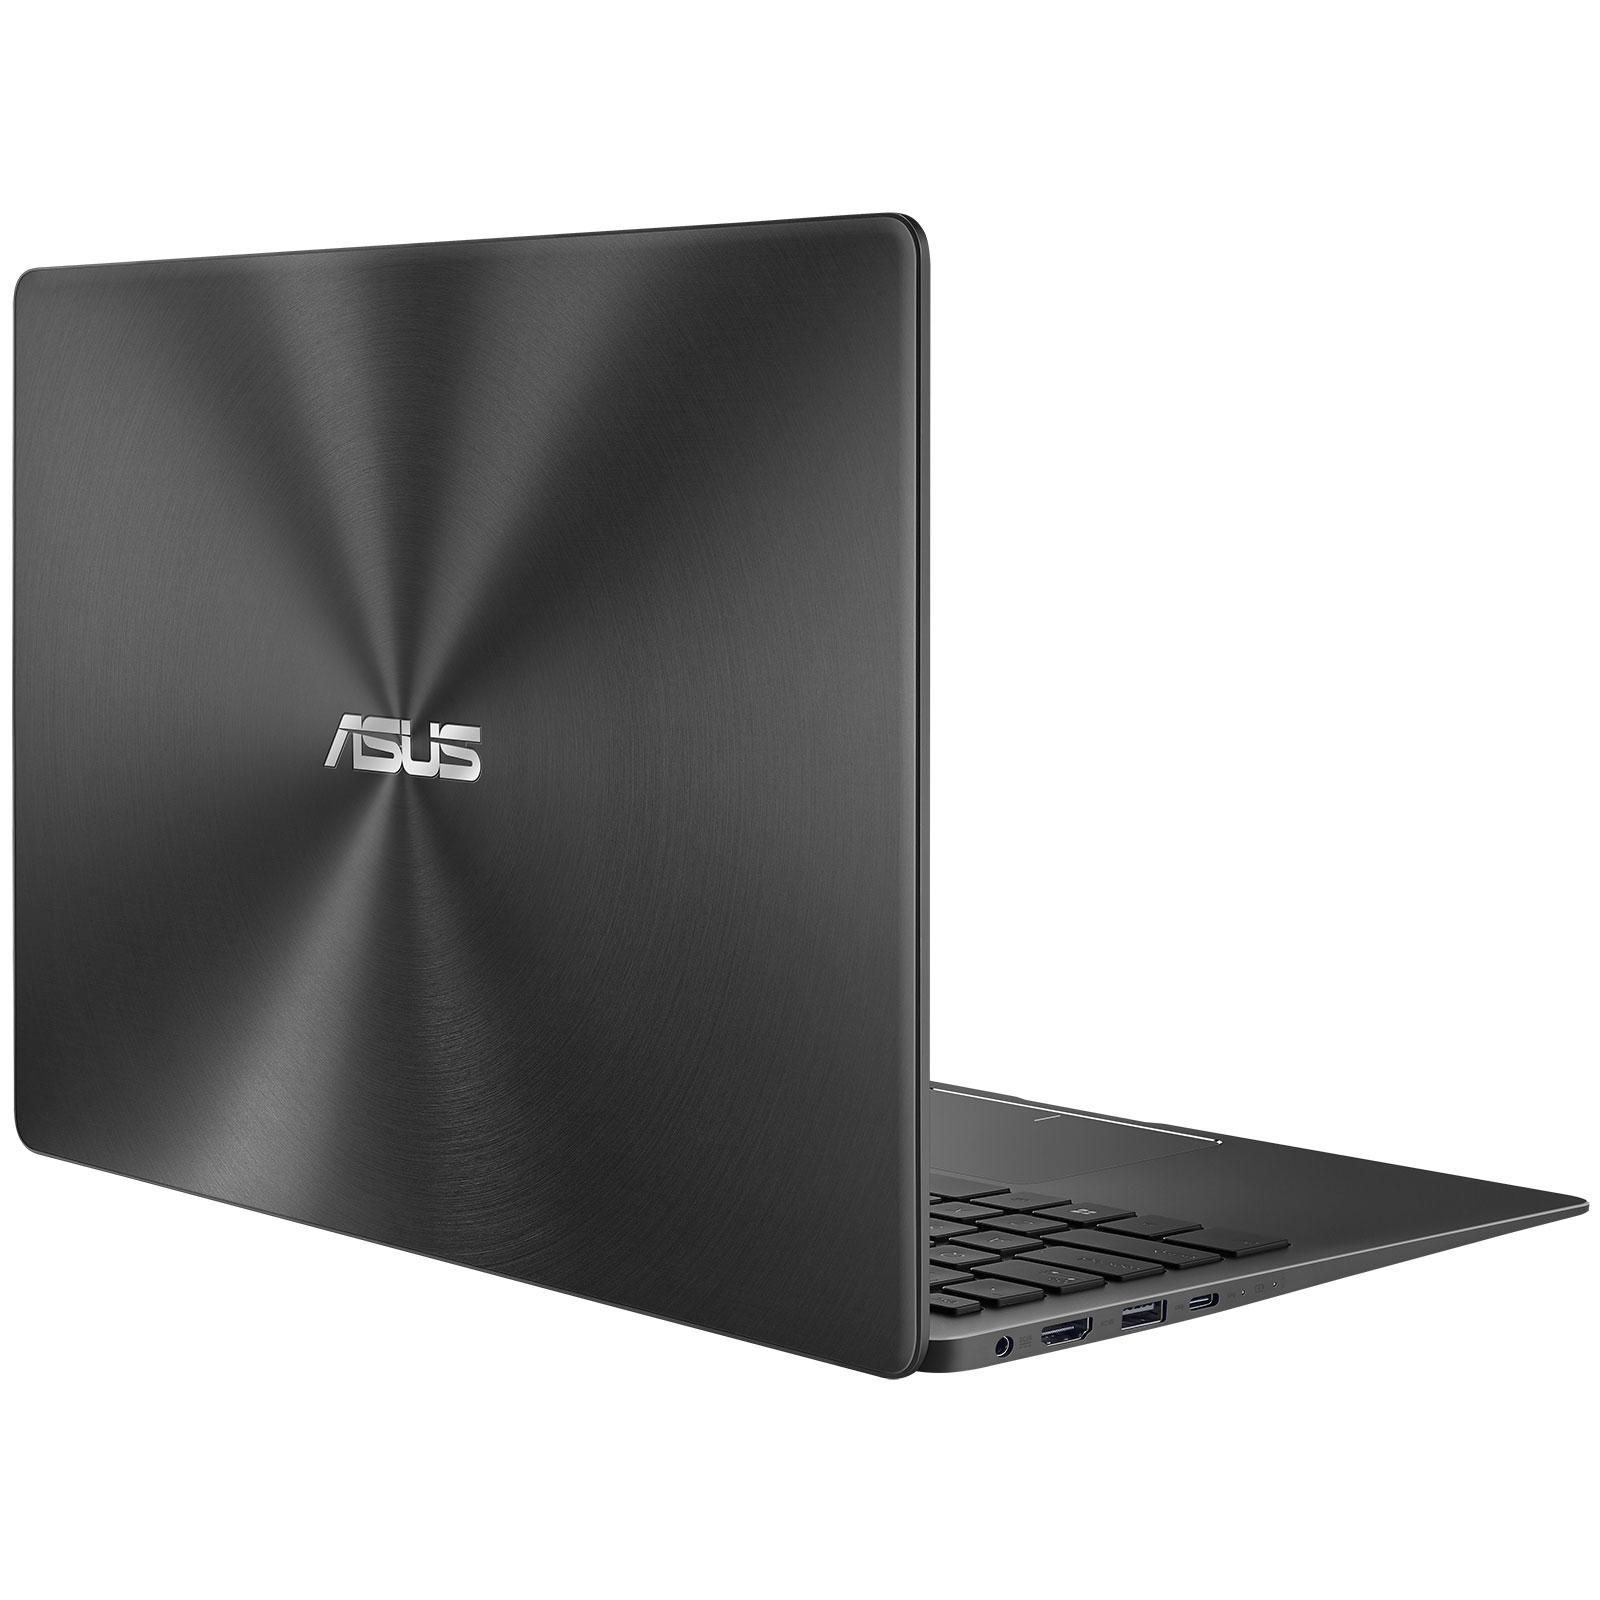 Asus UX331UA-EG012R - PC portable Asus - Cybertek.fr - 2